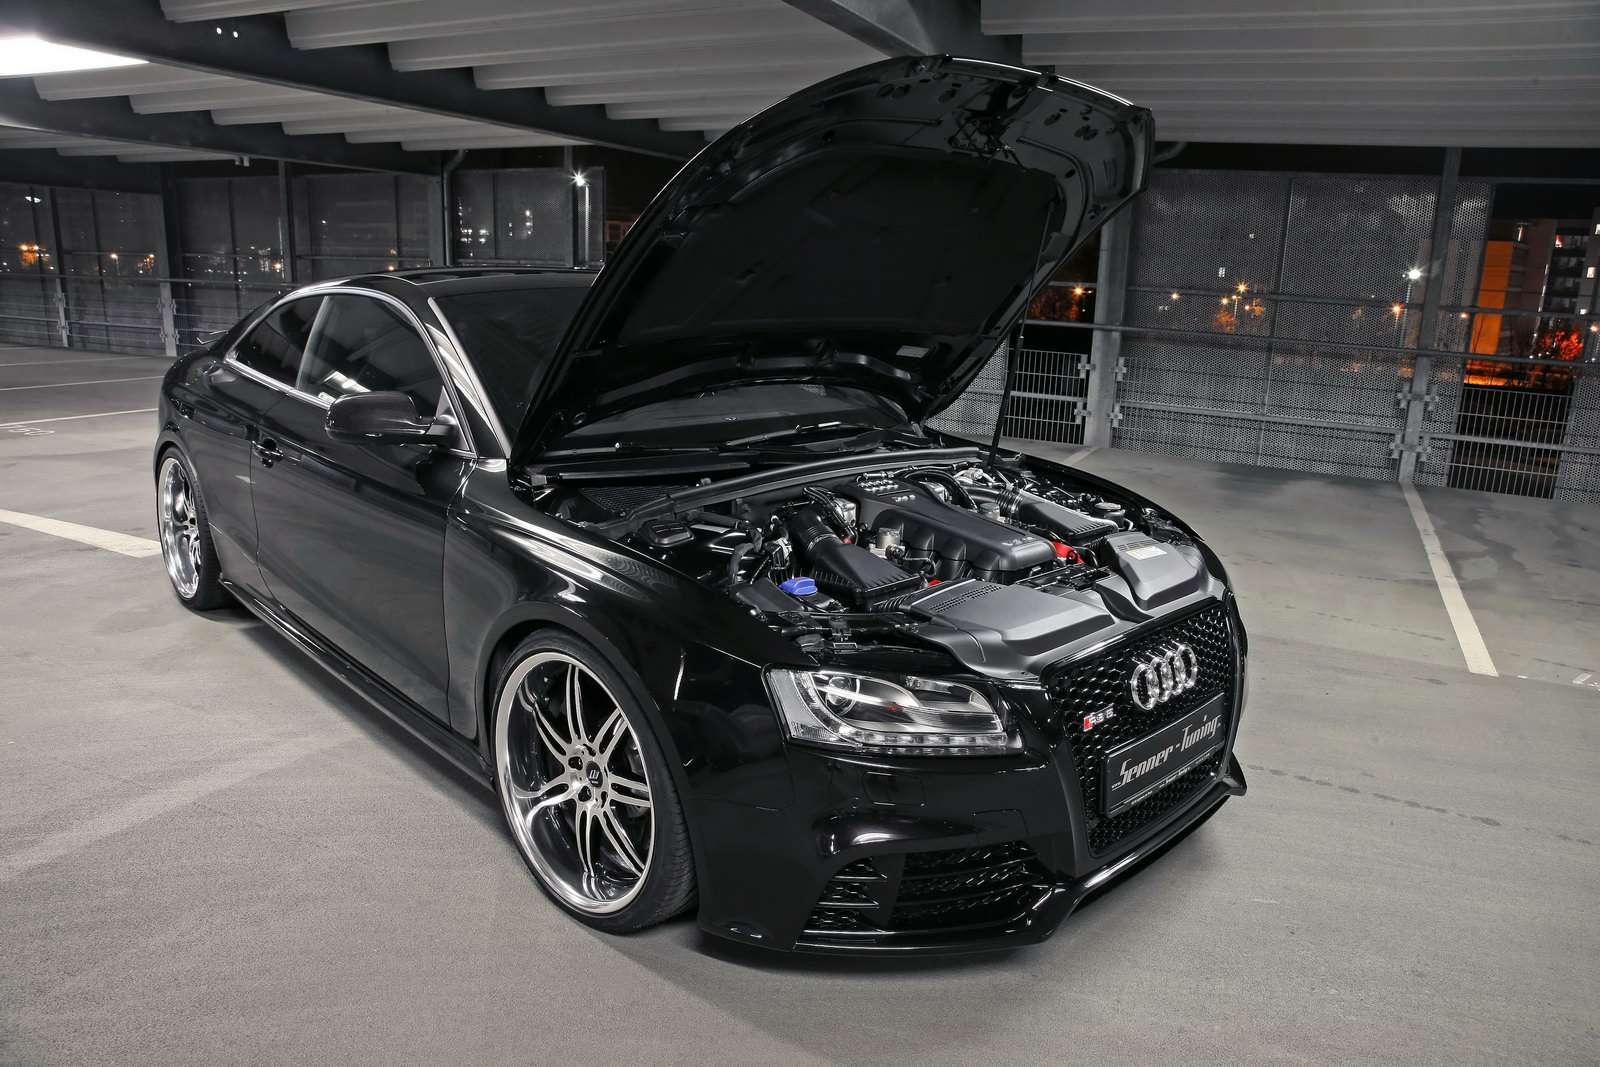 Audi RS5 od Senner Tuning fot grudzien 2010